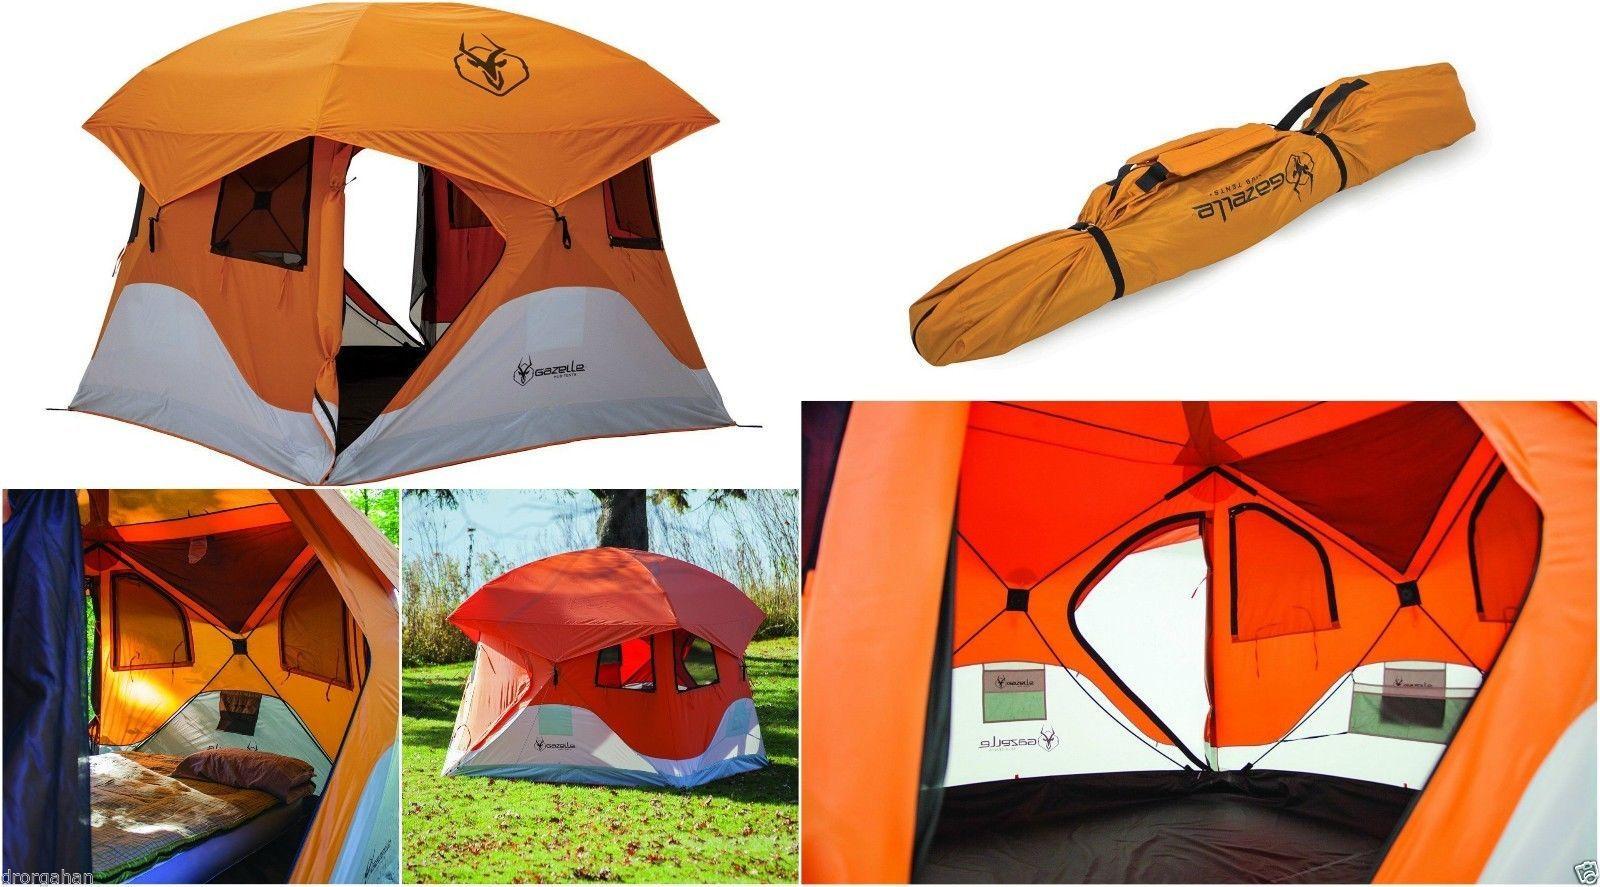 official photos 501aa 904c9 NEW 2017 HOT Qube Tent Gazelle 22272 Pop up Hub Portable ...